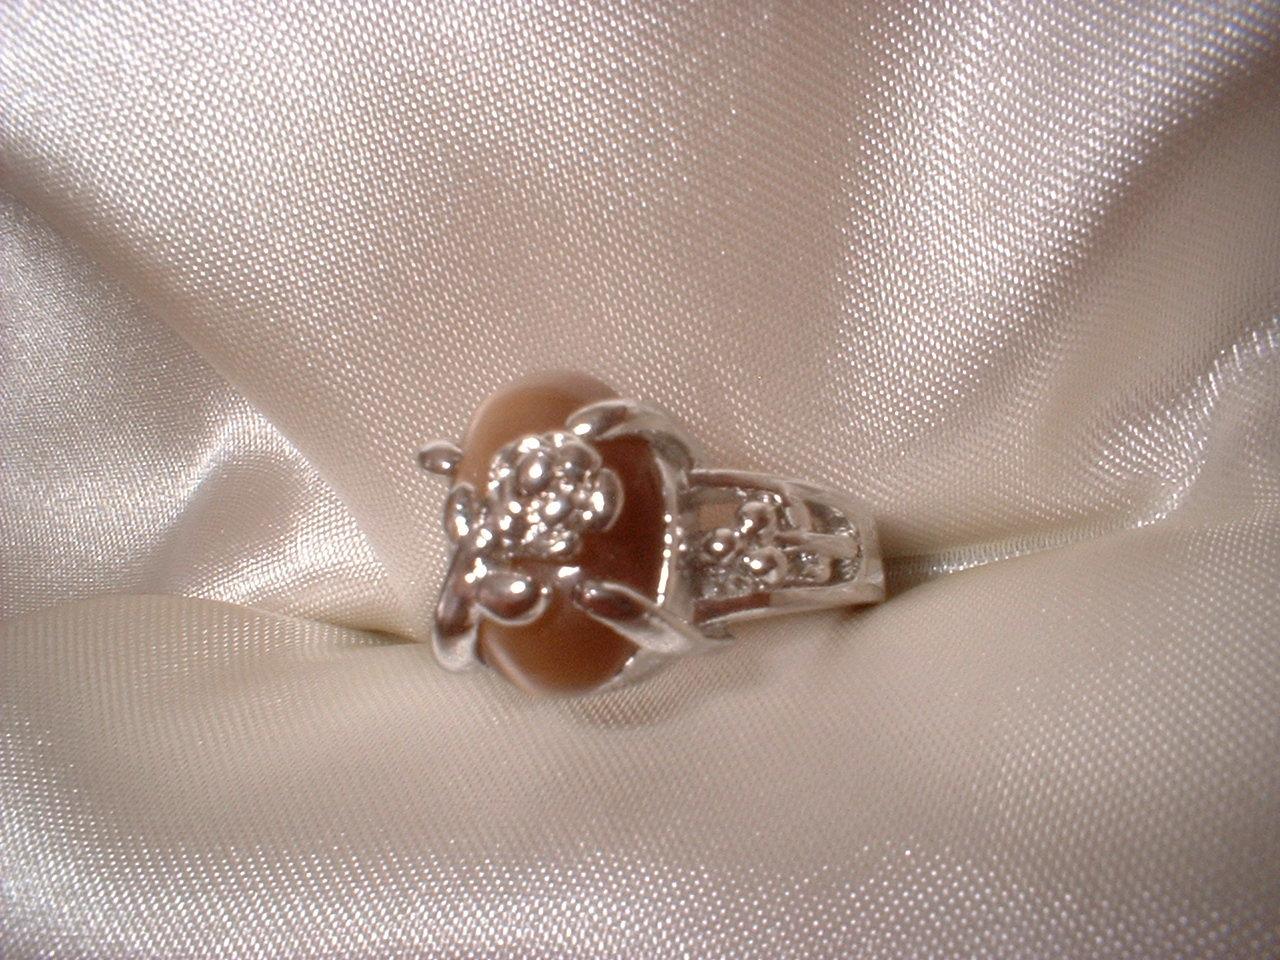 Brown Cats Eye Flower Ring Size 7  Bargain Bin Under $10.00